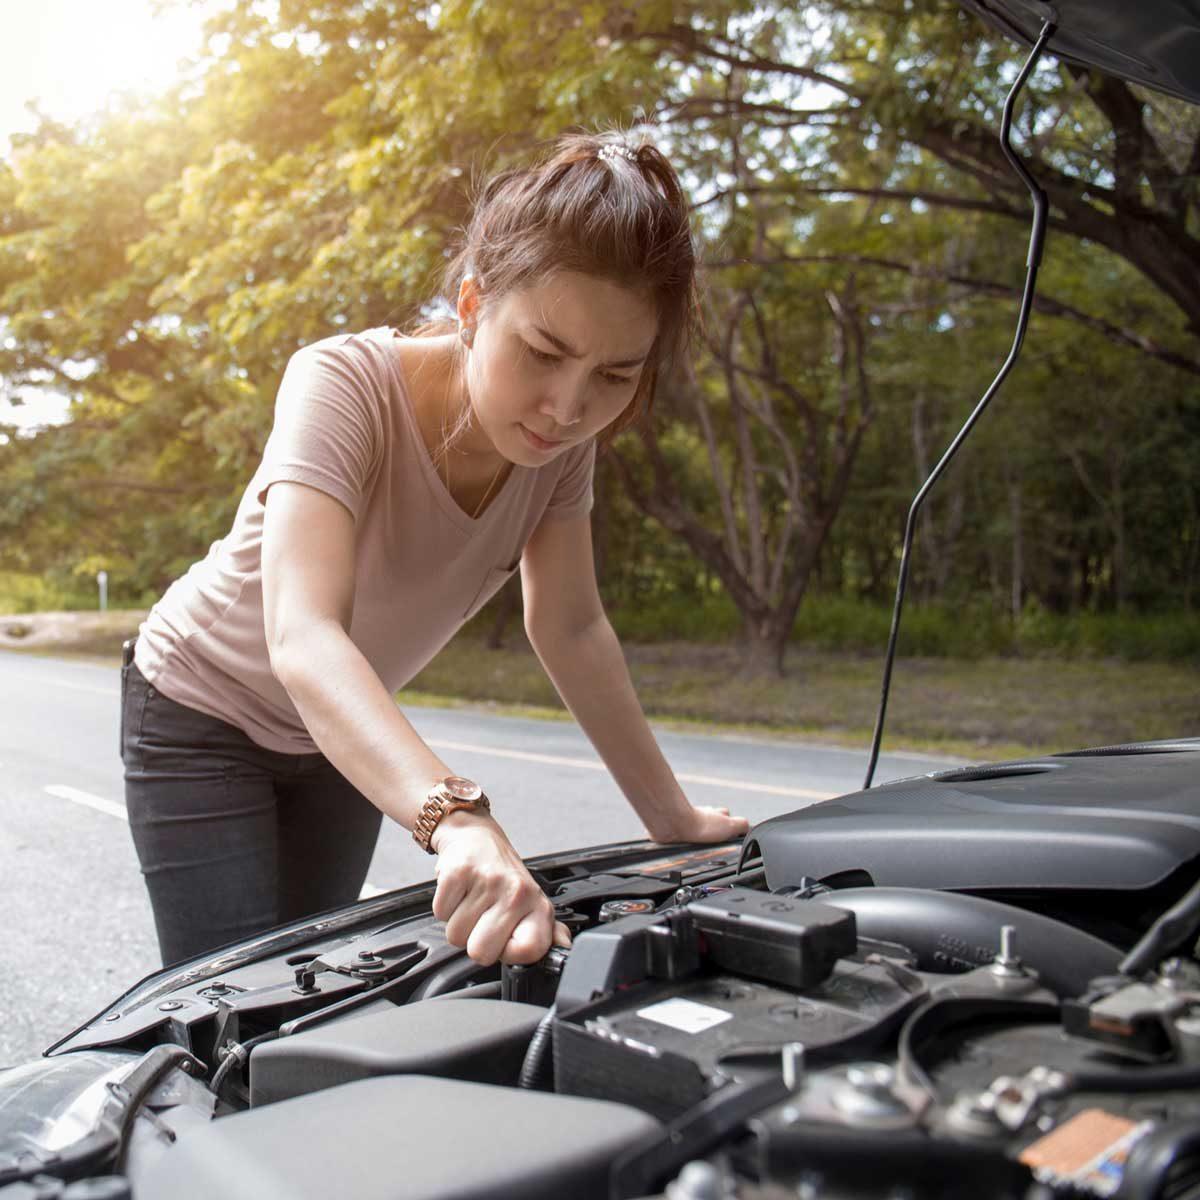 Woman examining car